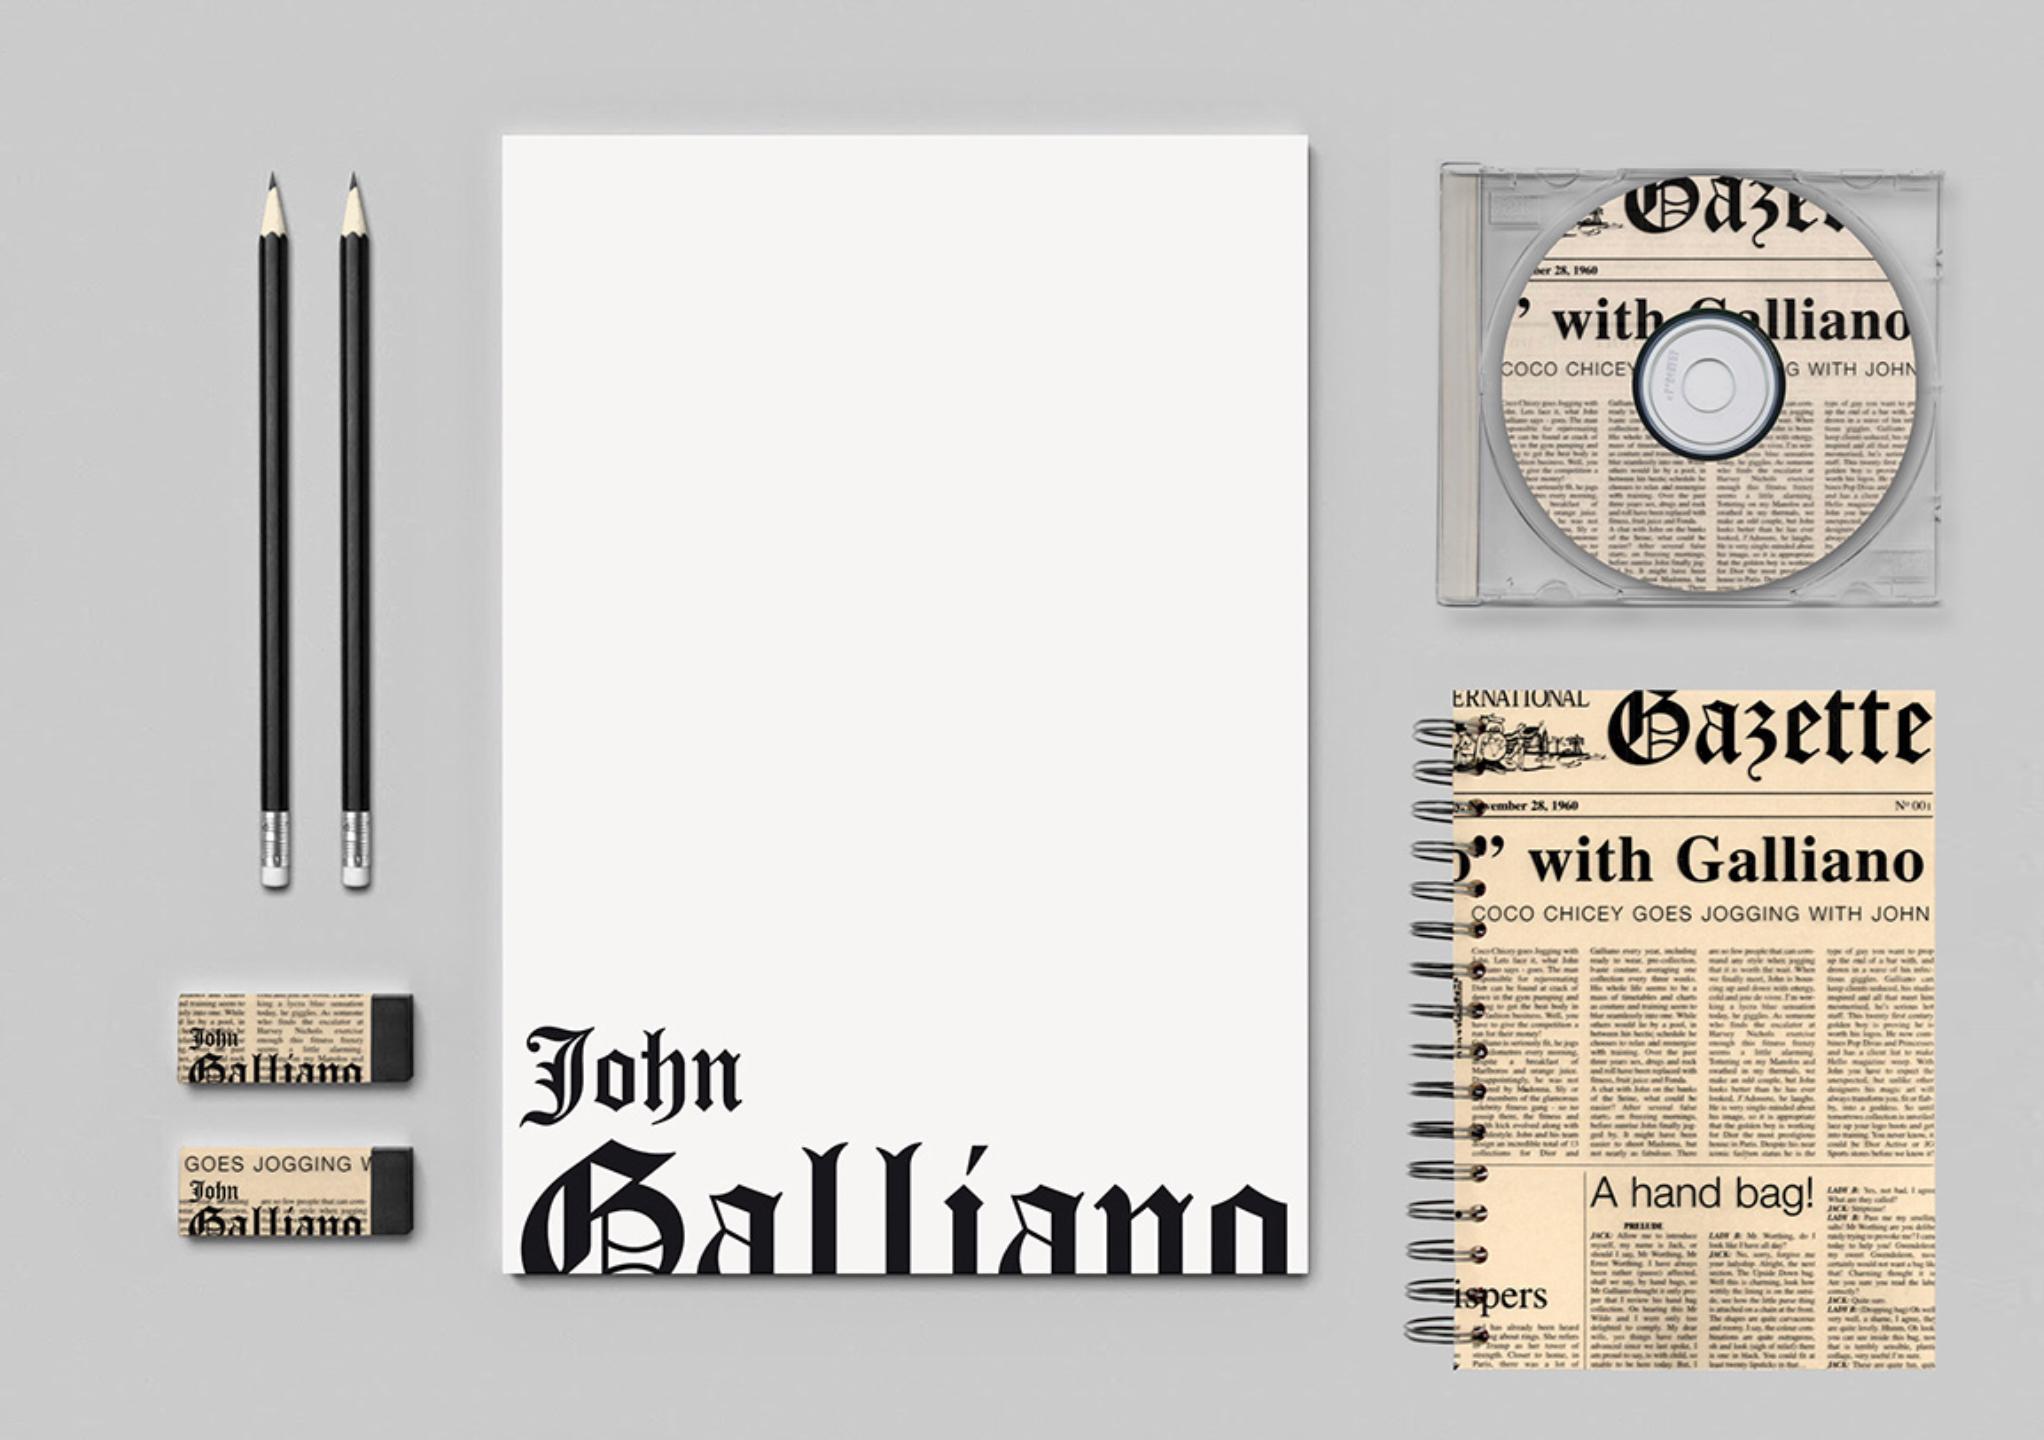 Galliano / identité visuelle